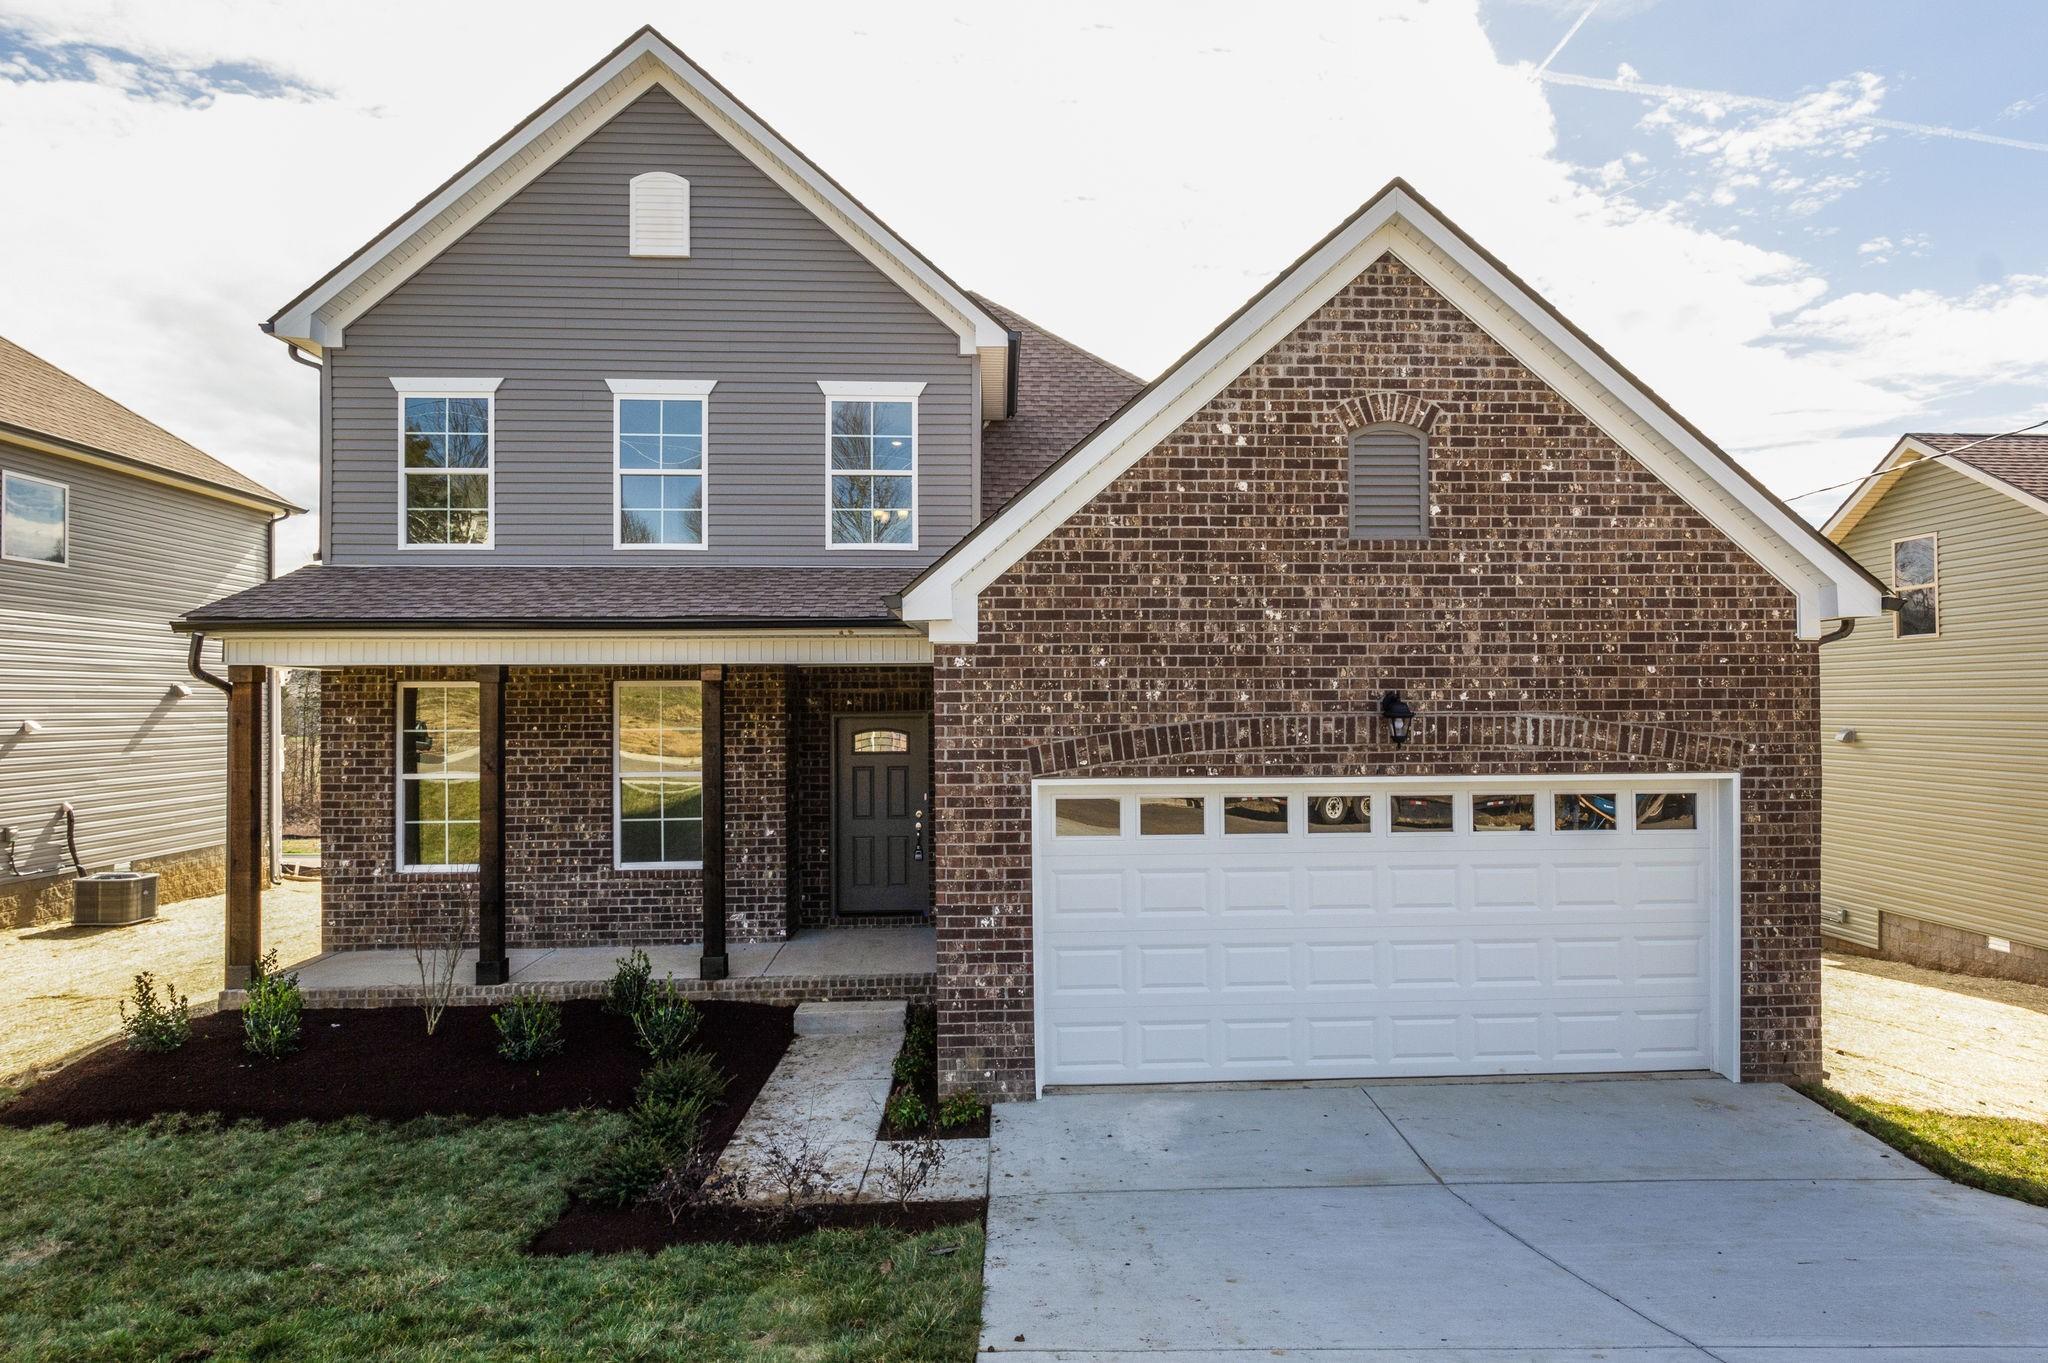 933 Mulberry Hill Pl Lot 174, Antioch, TN 37013 - Antioch, TN real estate listing